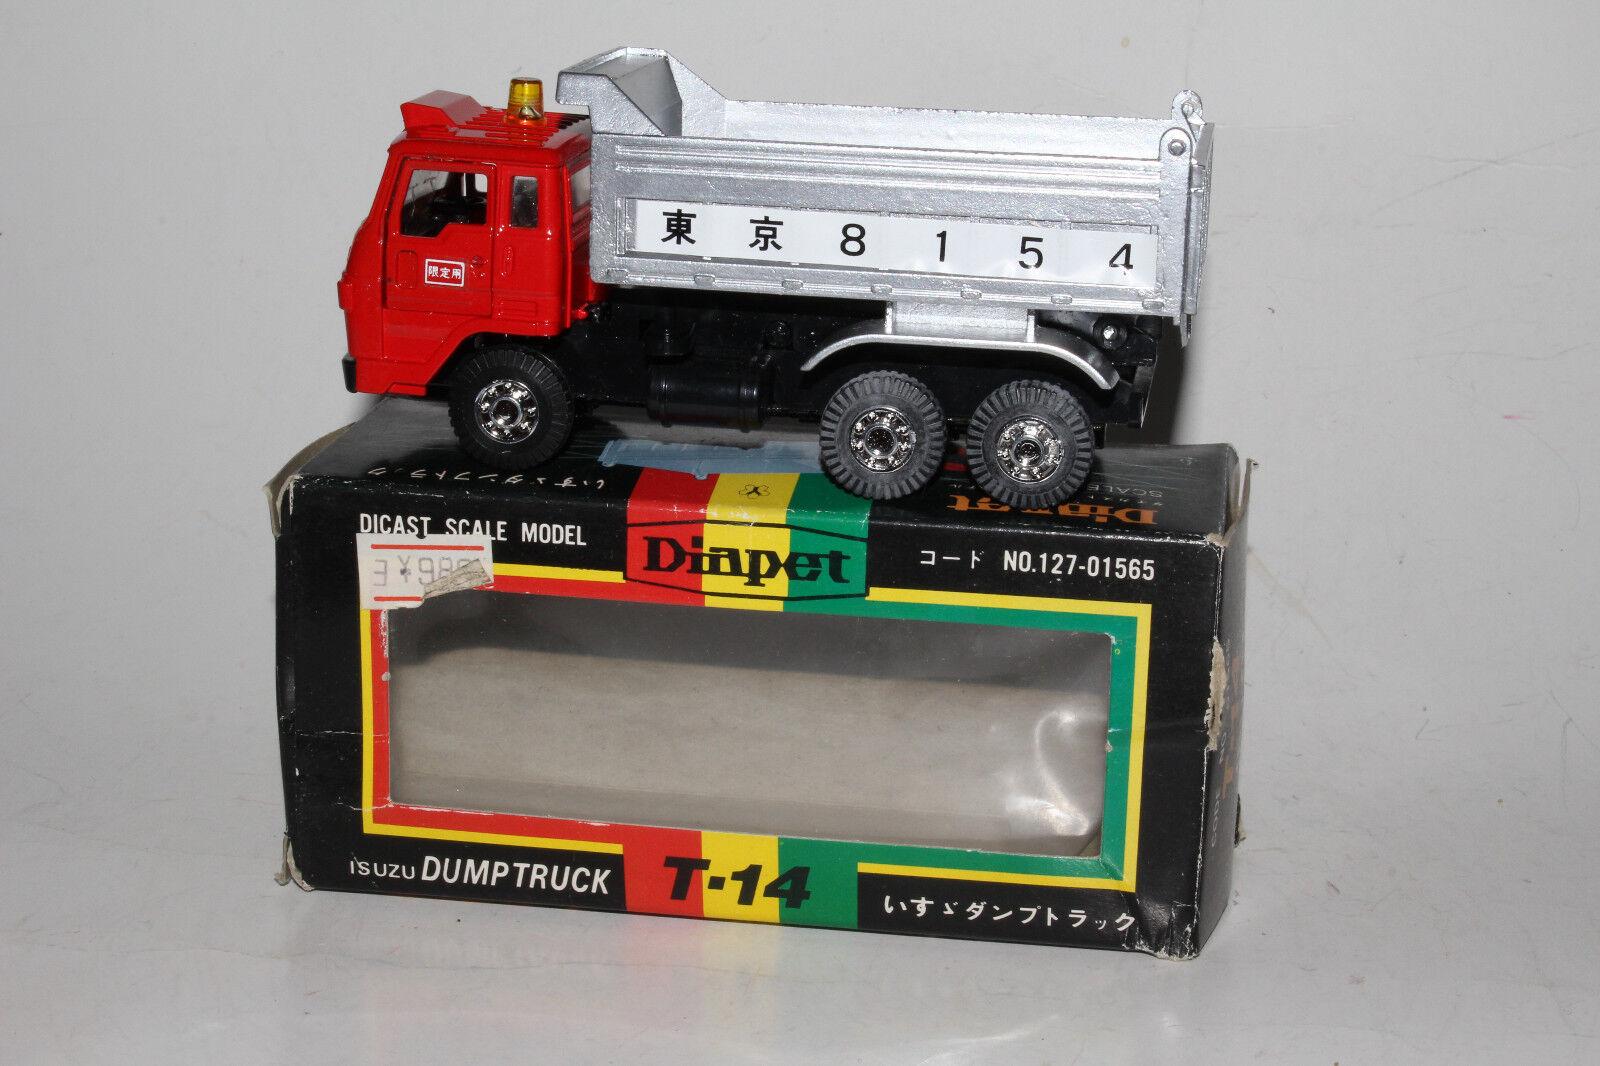 barato y de moda Diapet Yonezawa Diecast Diecast Diecast T-14 Isuzu Dump Truck, Excelente, En Caja  gran descuento